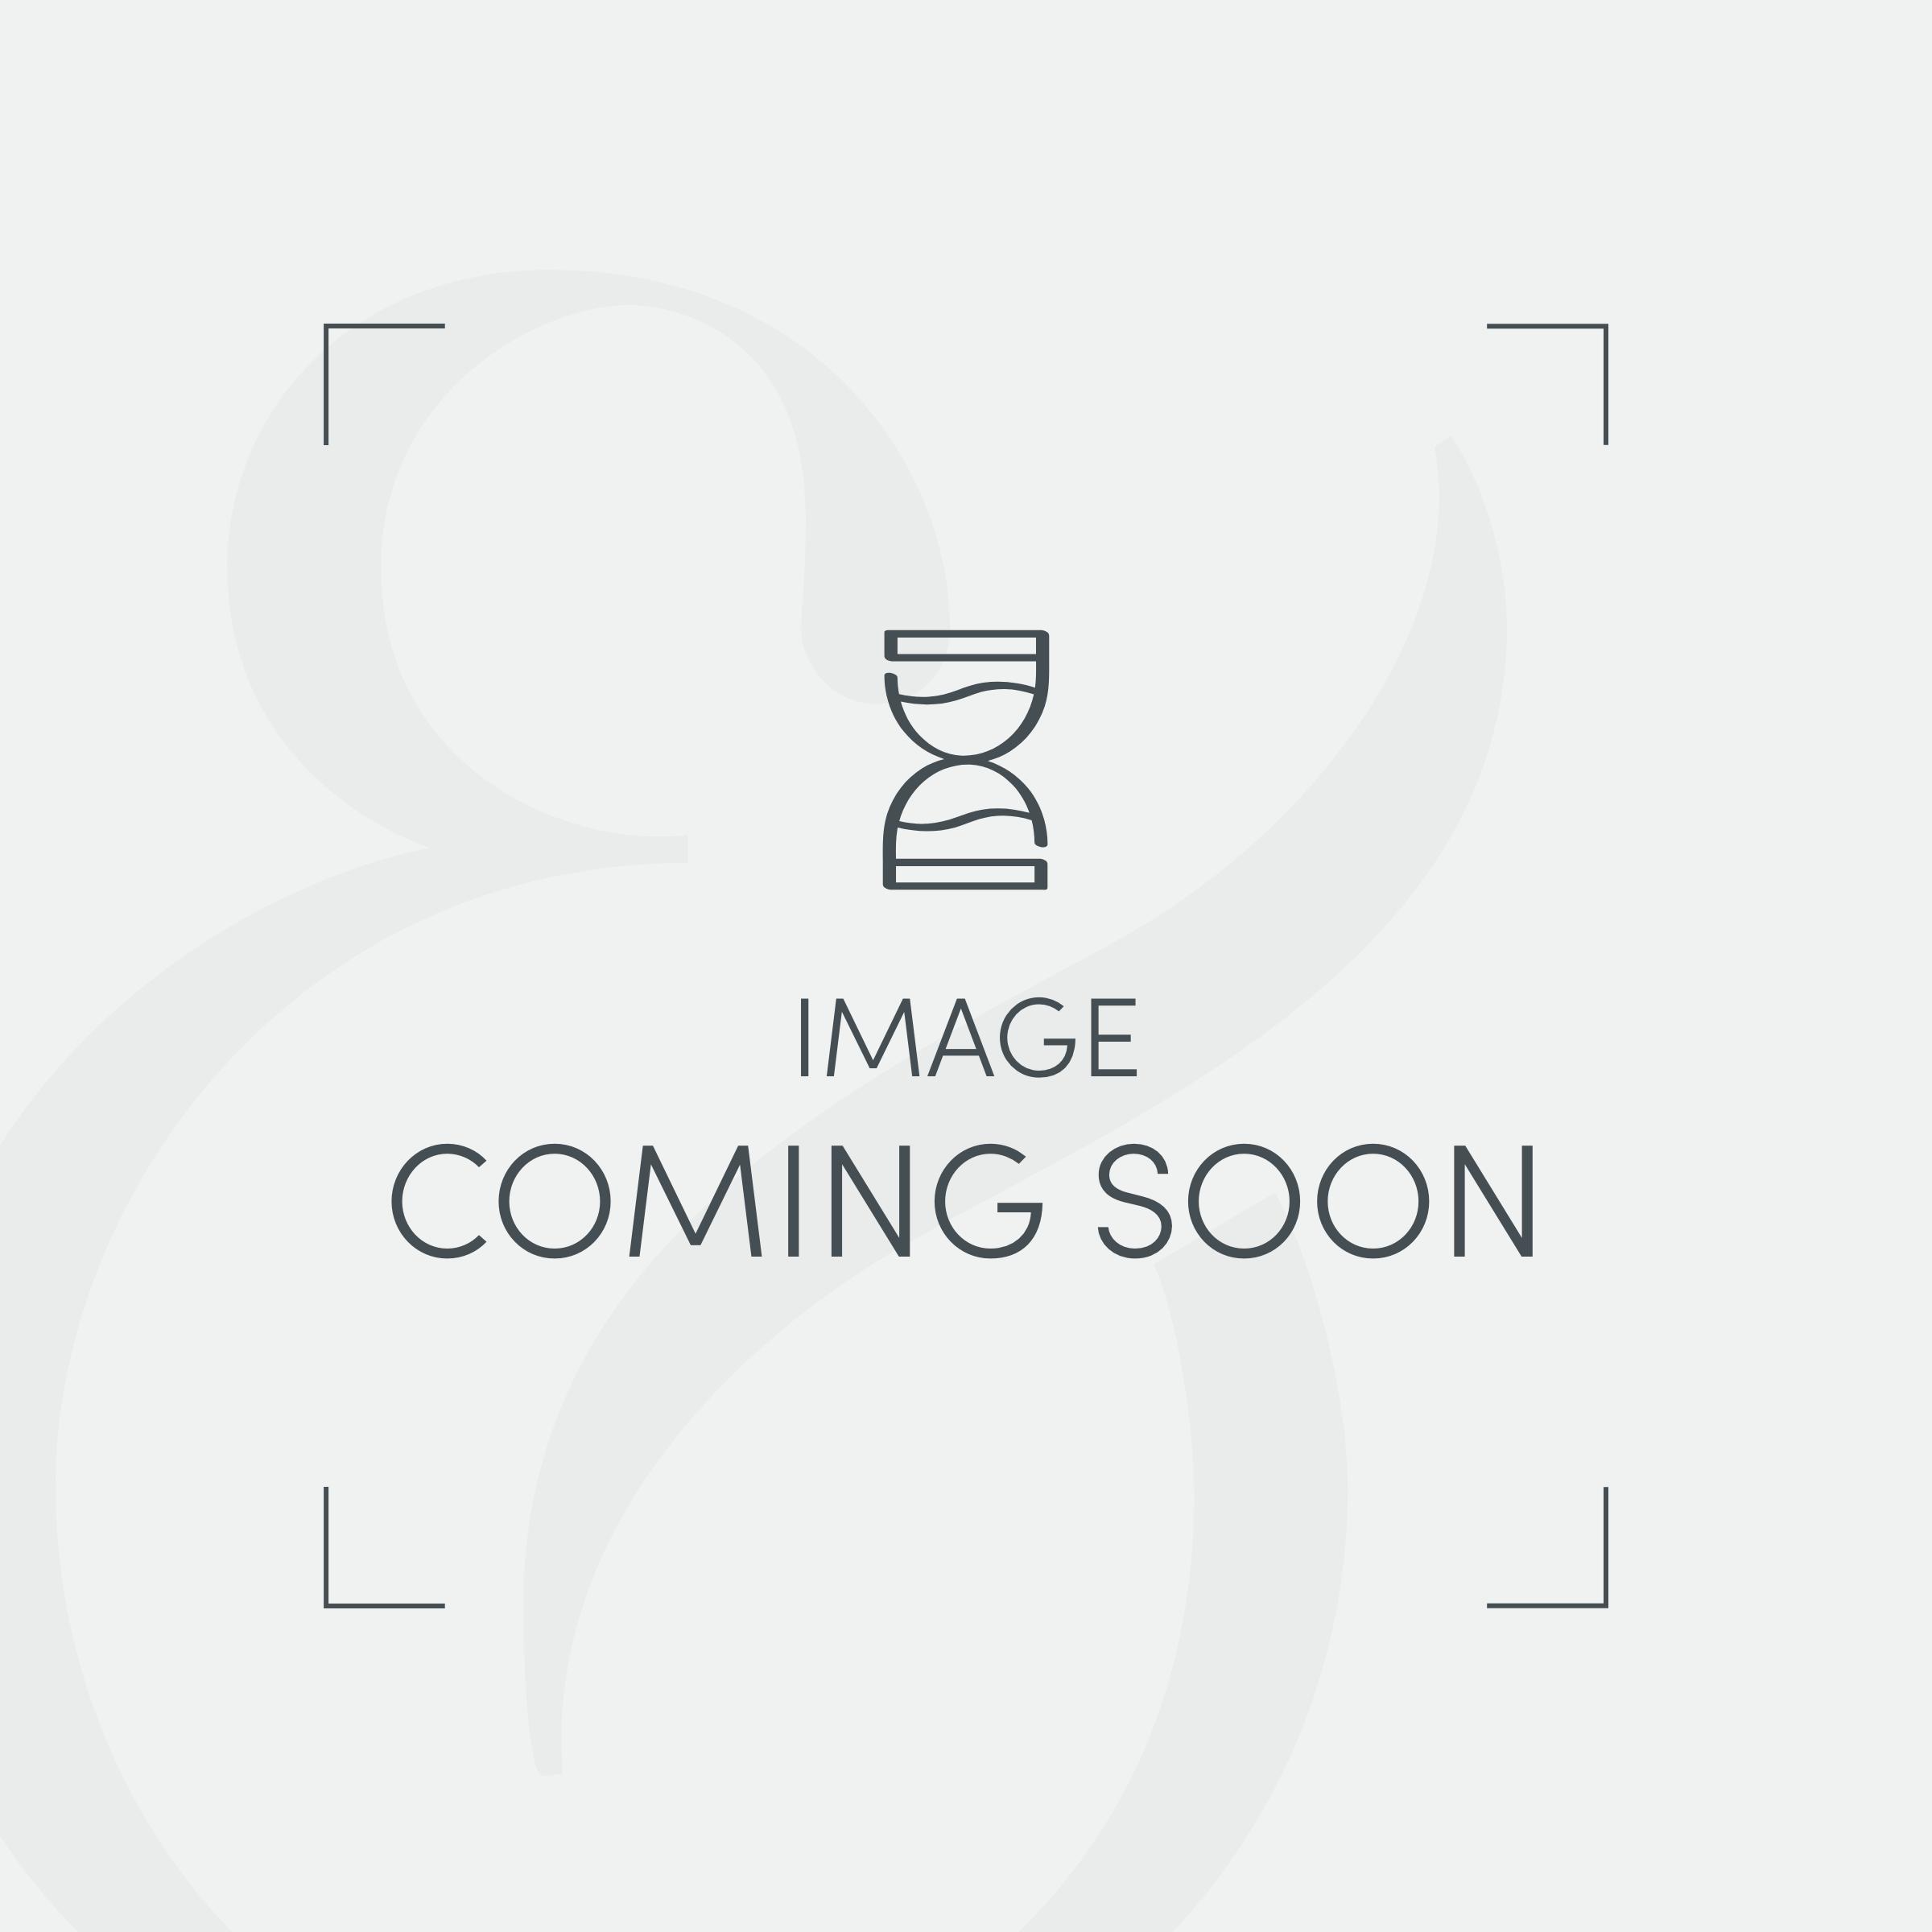 Luxury Cashmere 4000 Pocket Air Spring Pillow Top Double Mattress - Medium